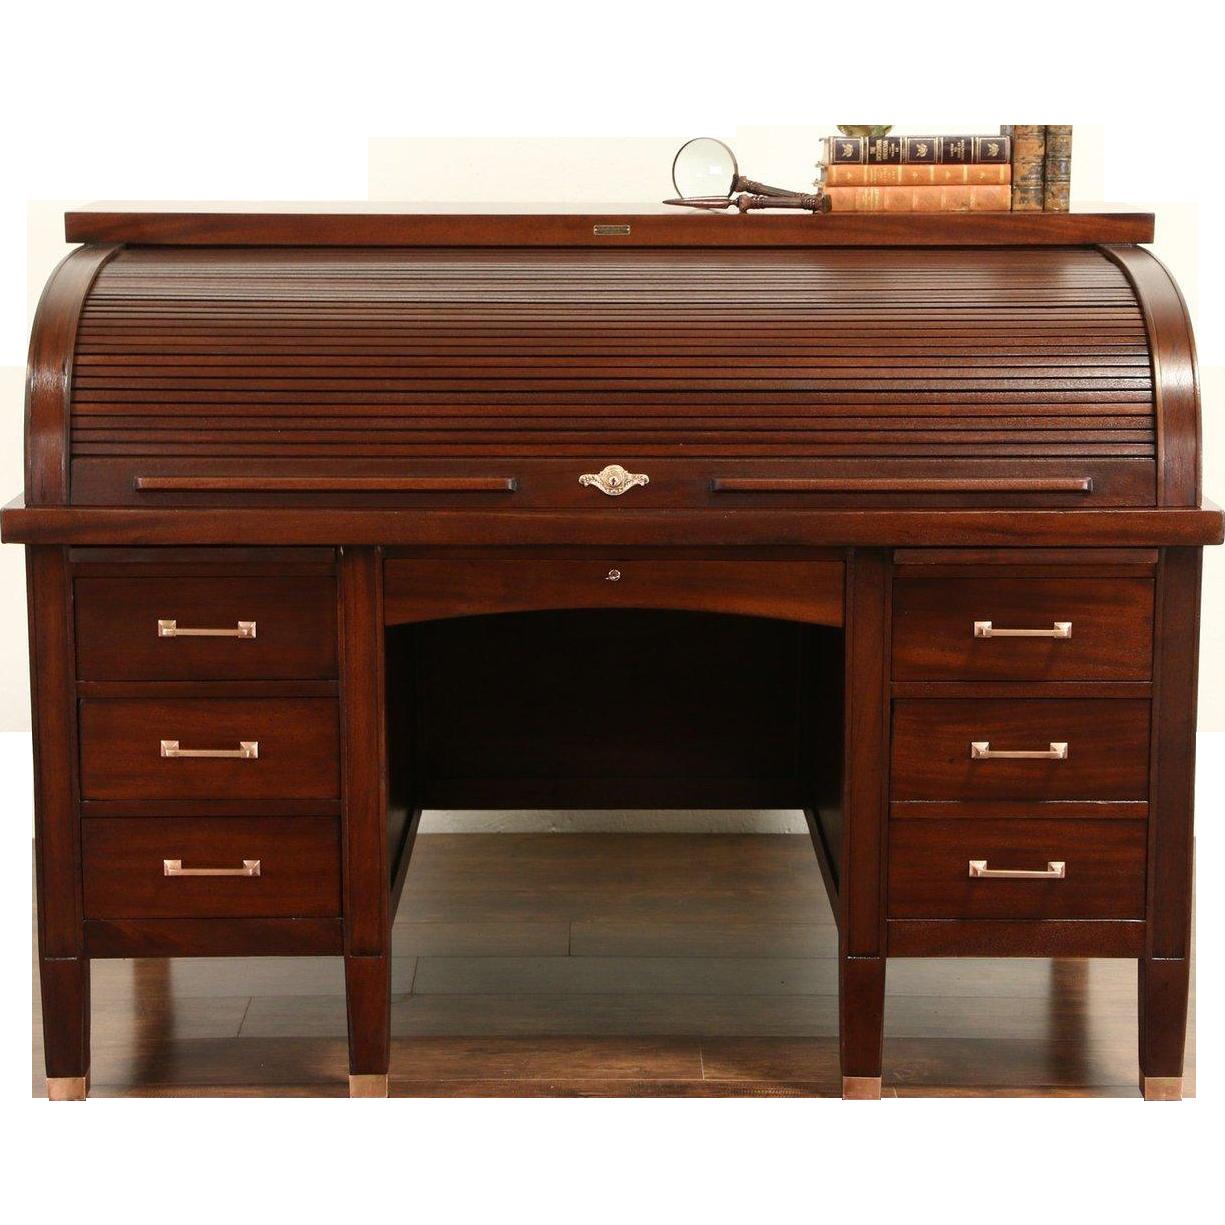 Mahogany C Curve 1910 Antique Roll Top Desk, Bronze Hardware, Signed Sabath